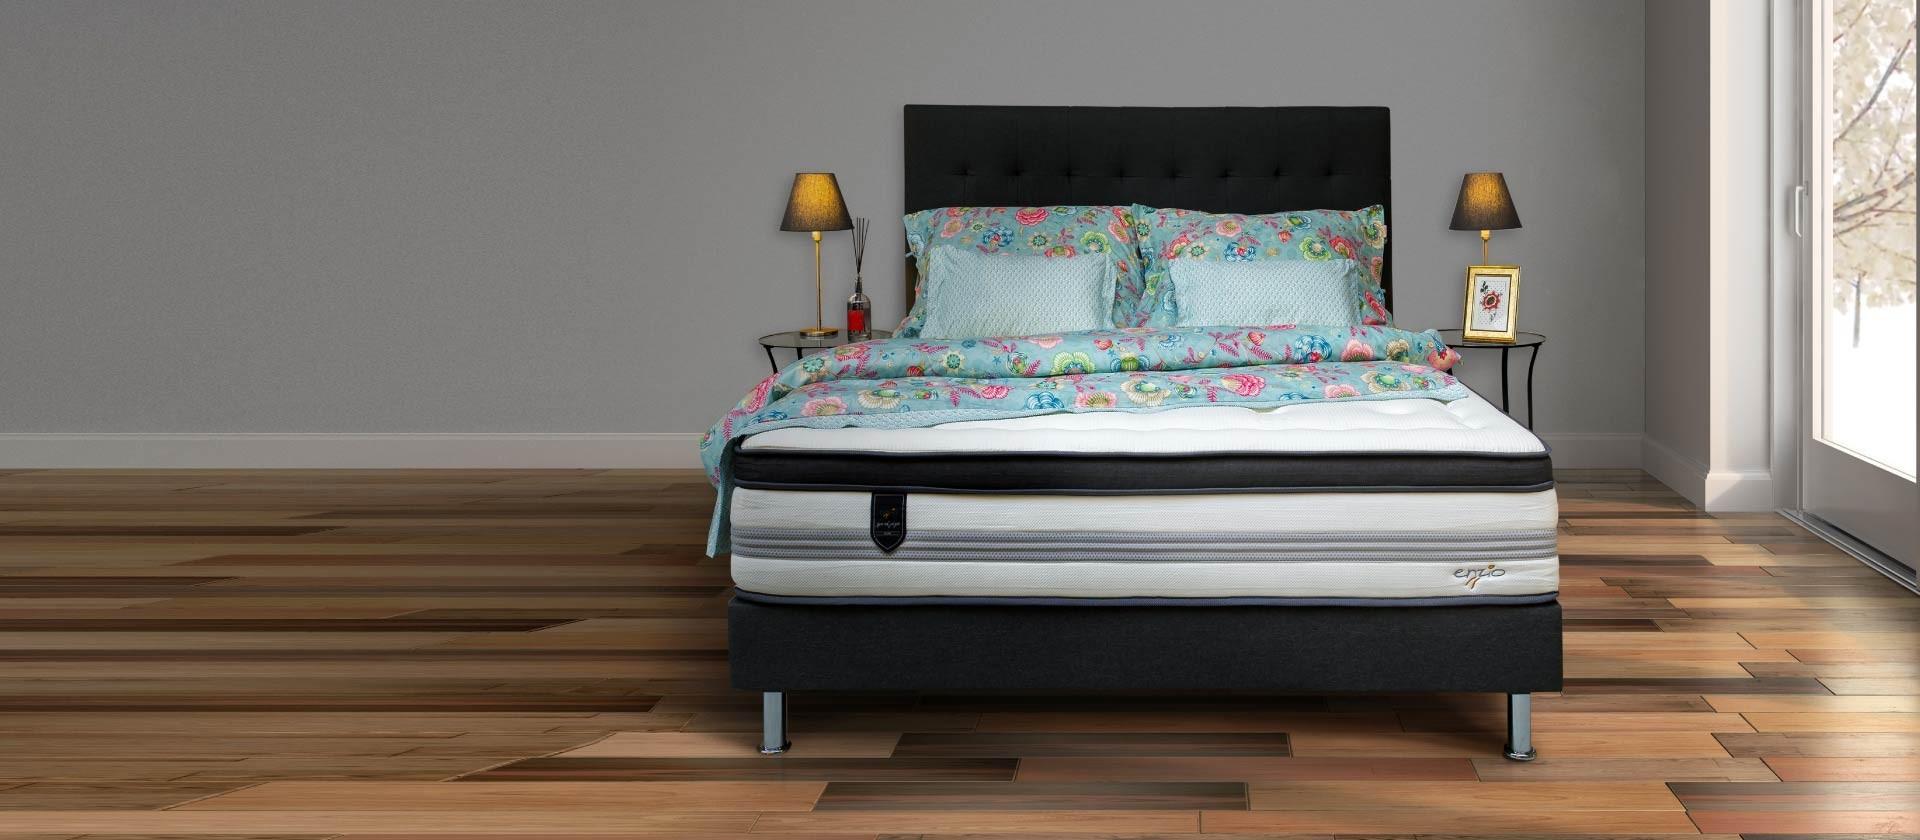 Łóżko Charles z materacem Cashmere Queen